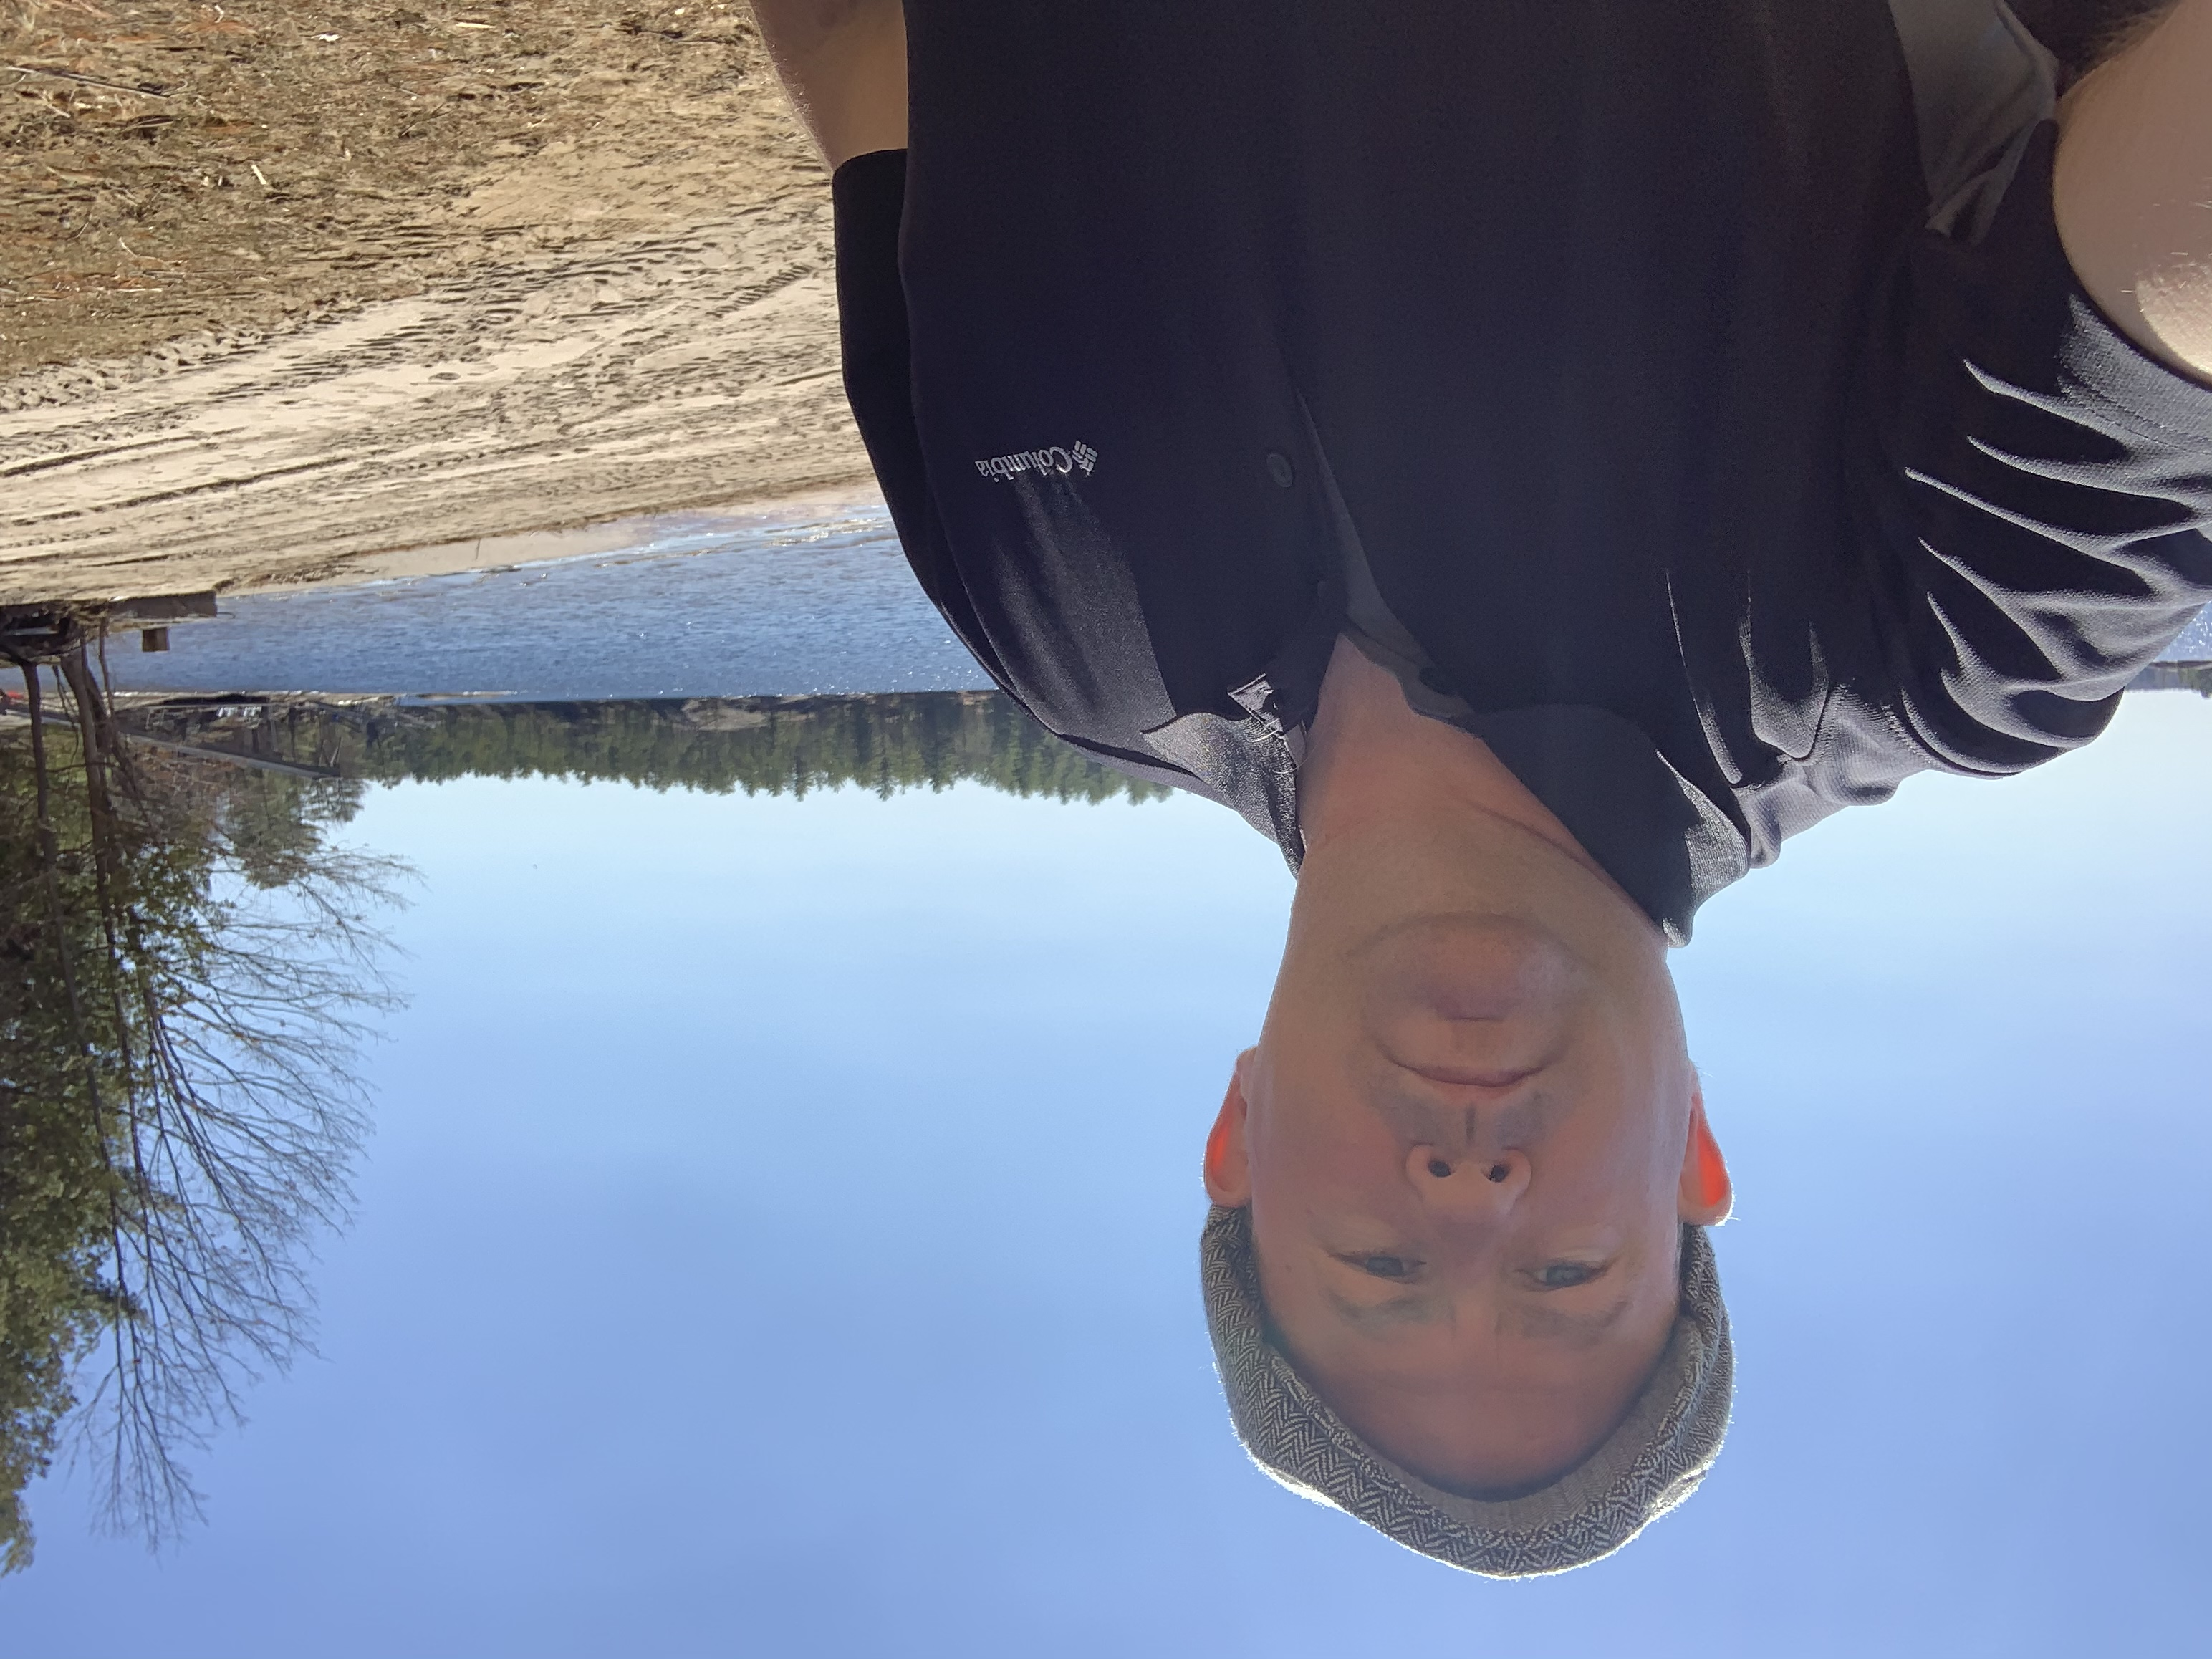 Brad Sinclair, Real Estate Agent for Kasshabog Lake